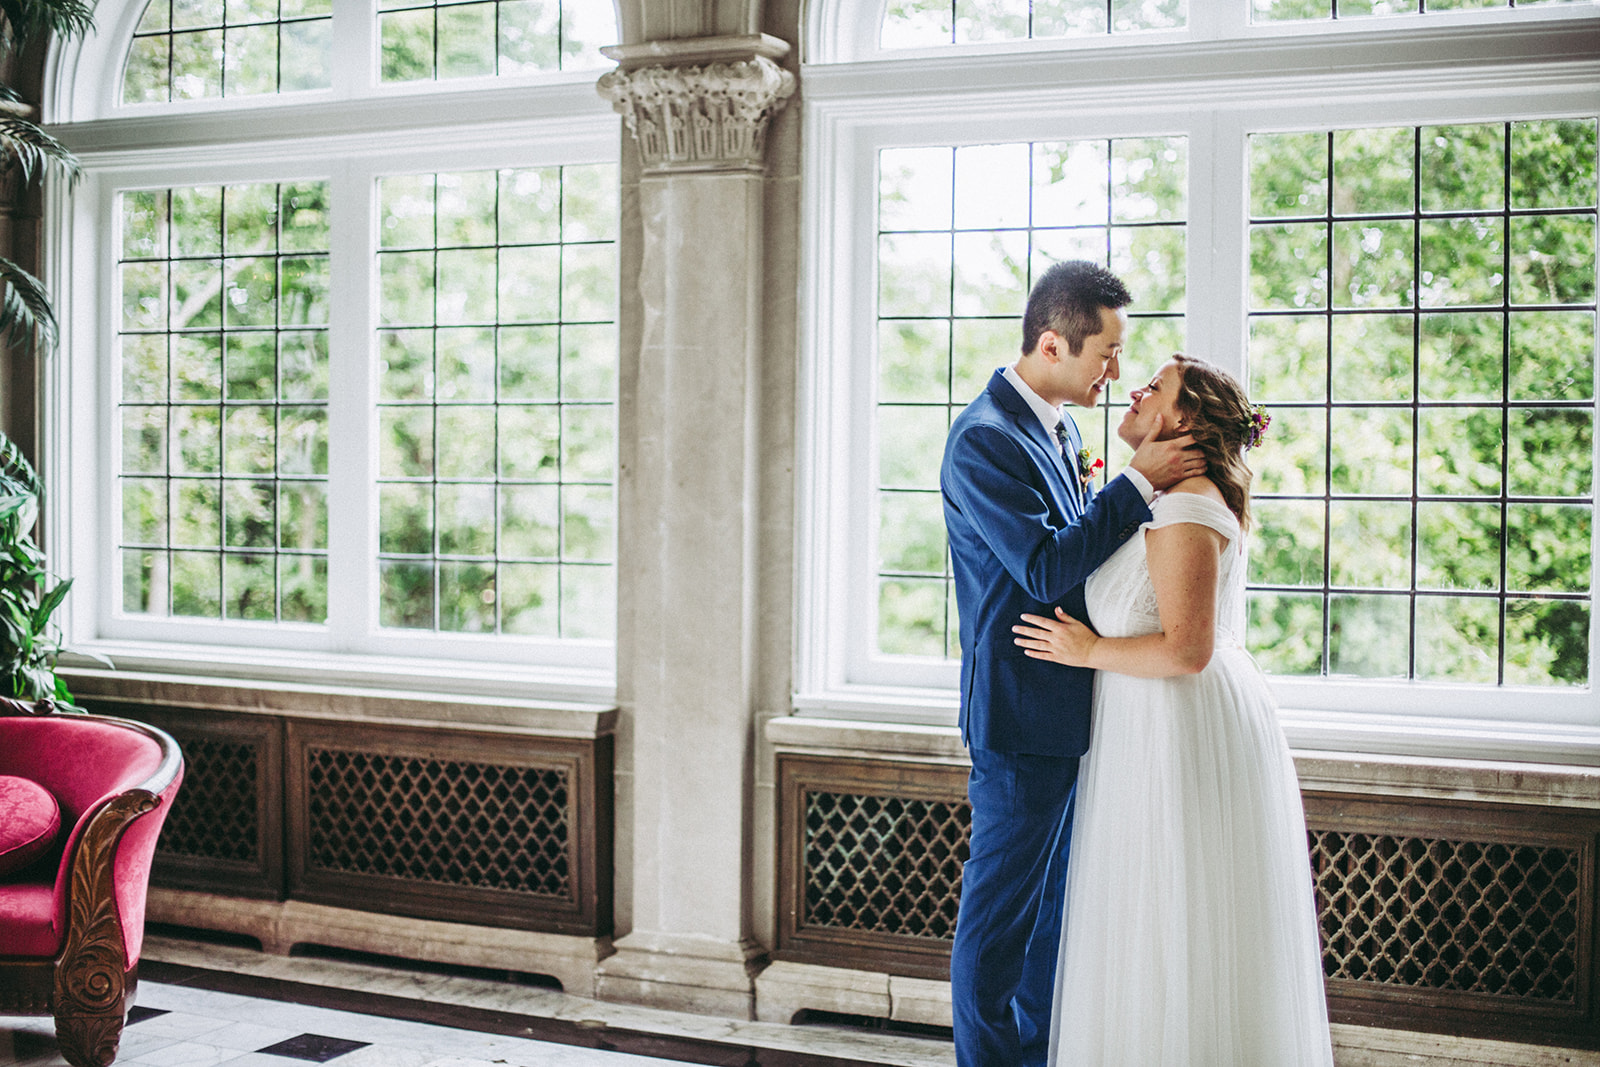 Laurel Hall bride and groom portrait session